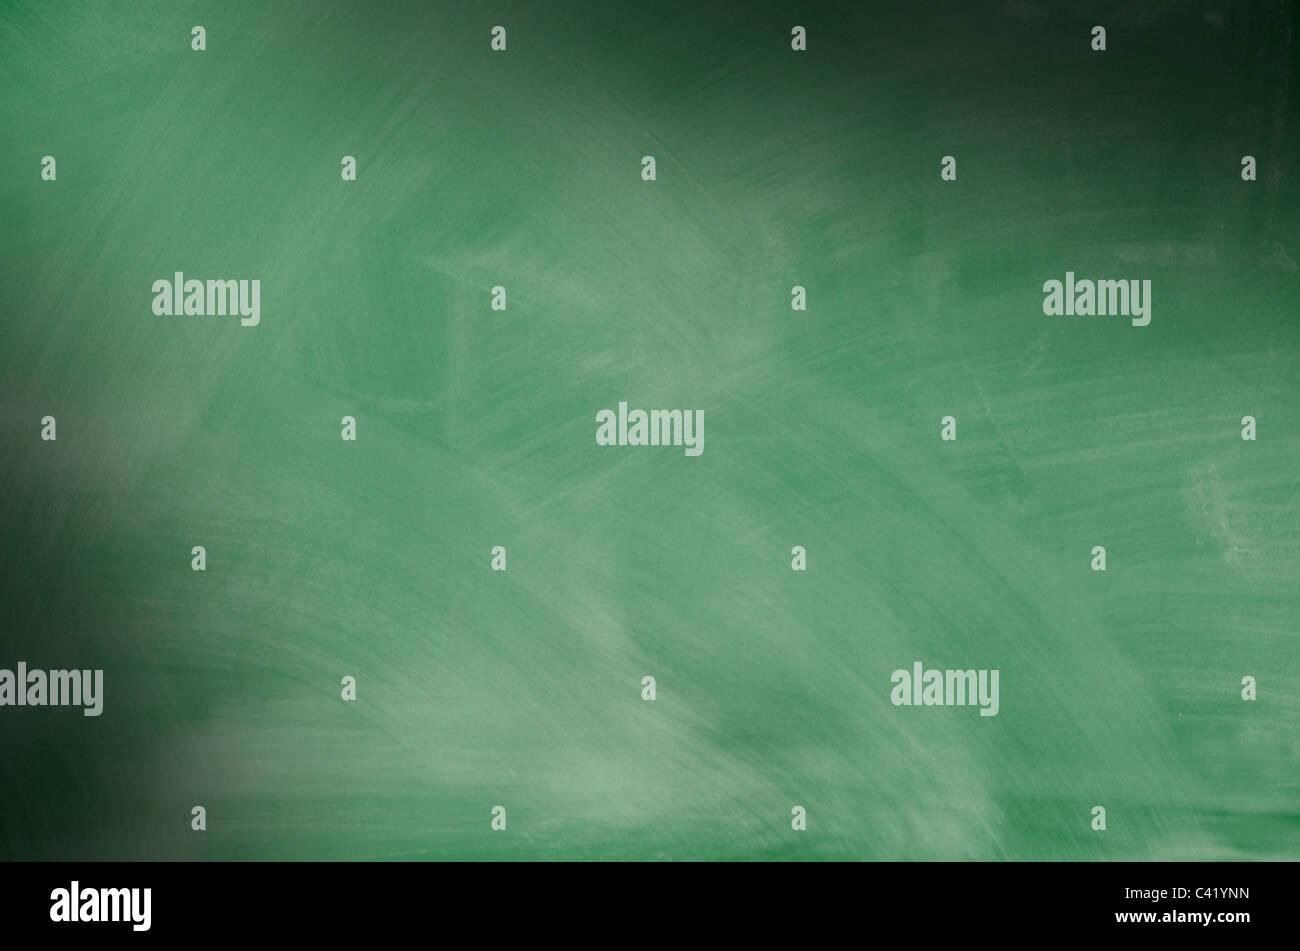 Grünen Tafel mit verschmierten Kreidestriche Radiergummi diagonal beleuchtet Stockbild